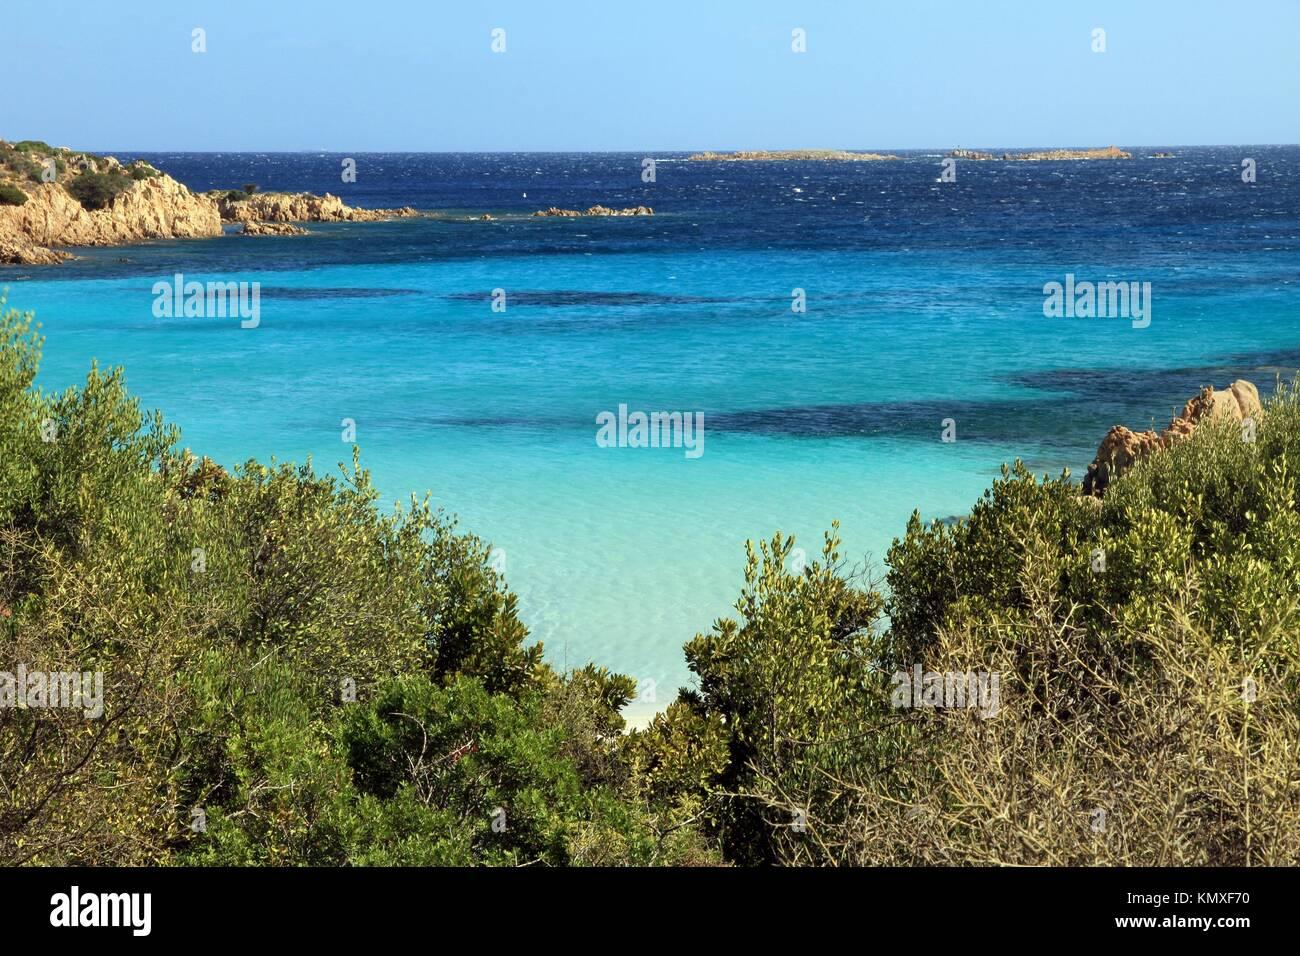 Smerald coast, Principe cove in Arzachena, Olbia province, Sardinia island, Italy - Stock Image